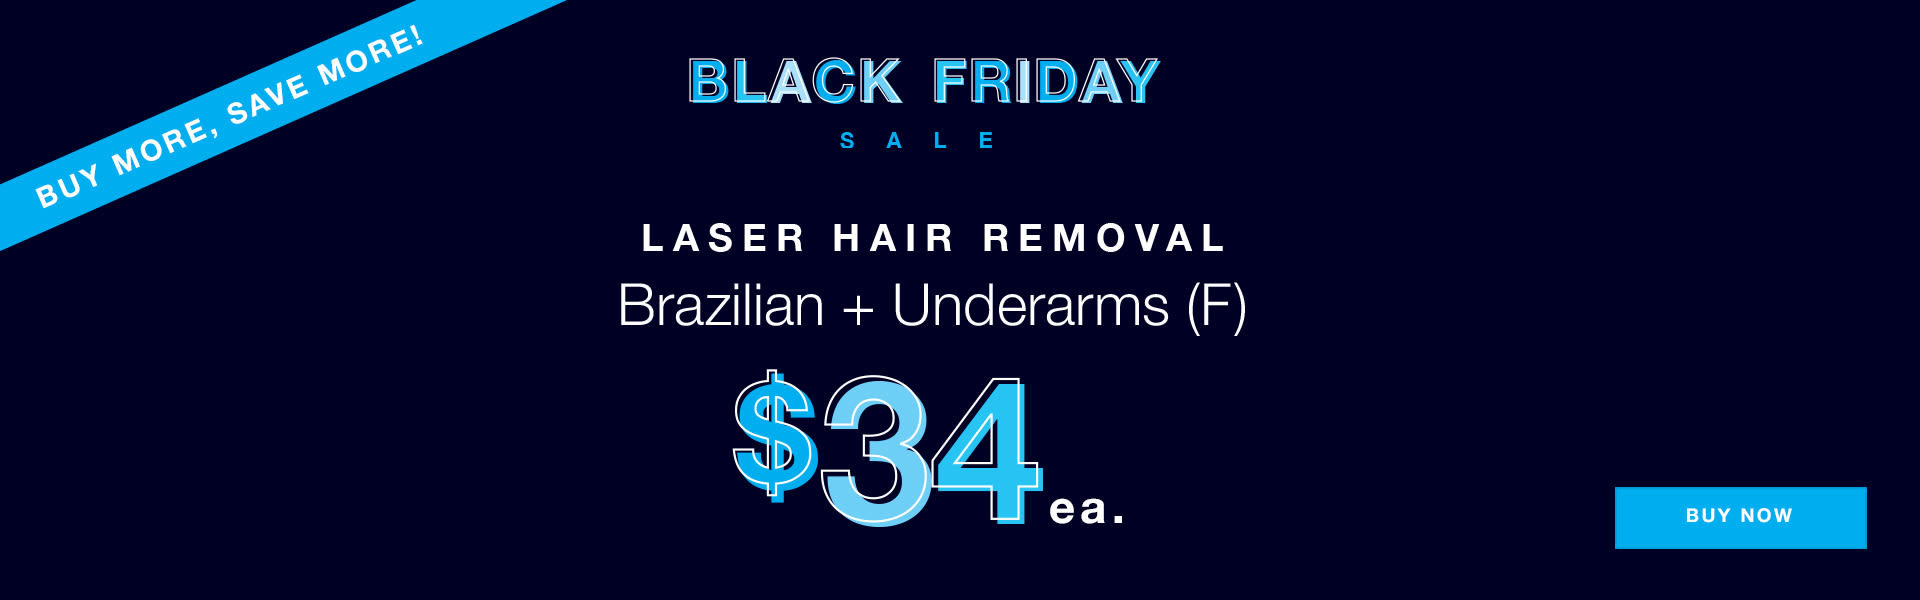 ClinicSite_Laser_BlackFriday-Braz+Underarms